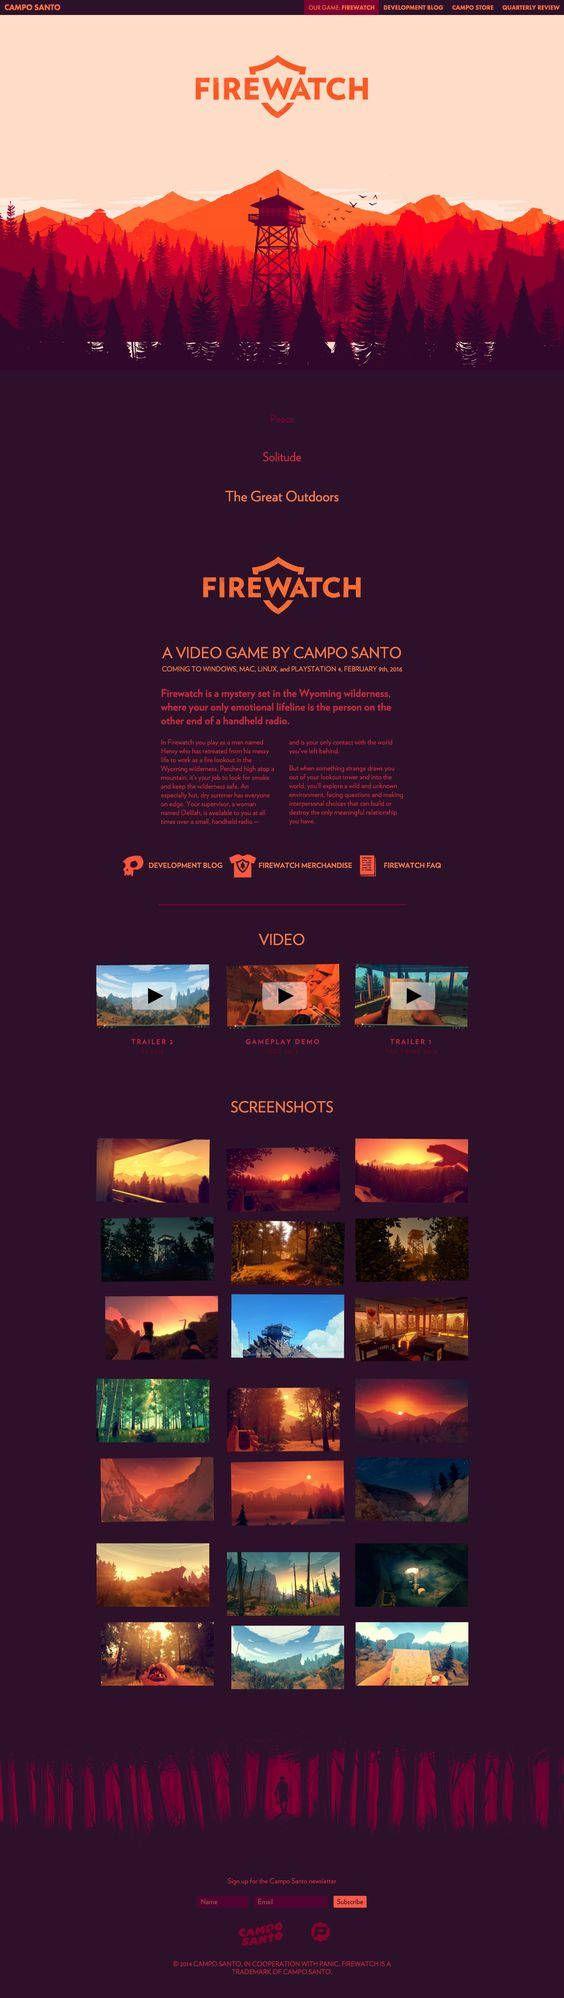 video game website design